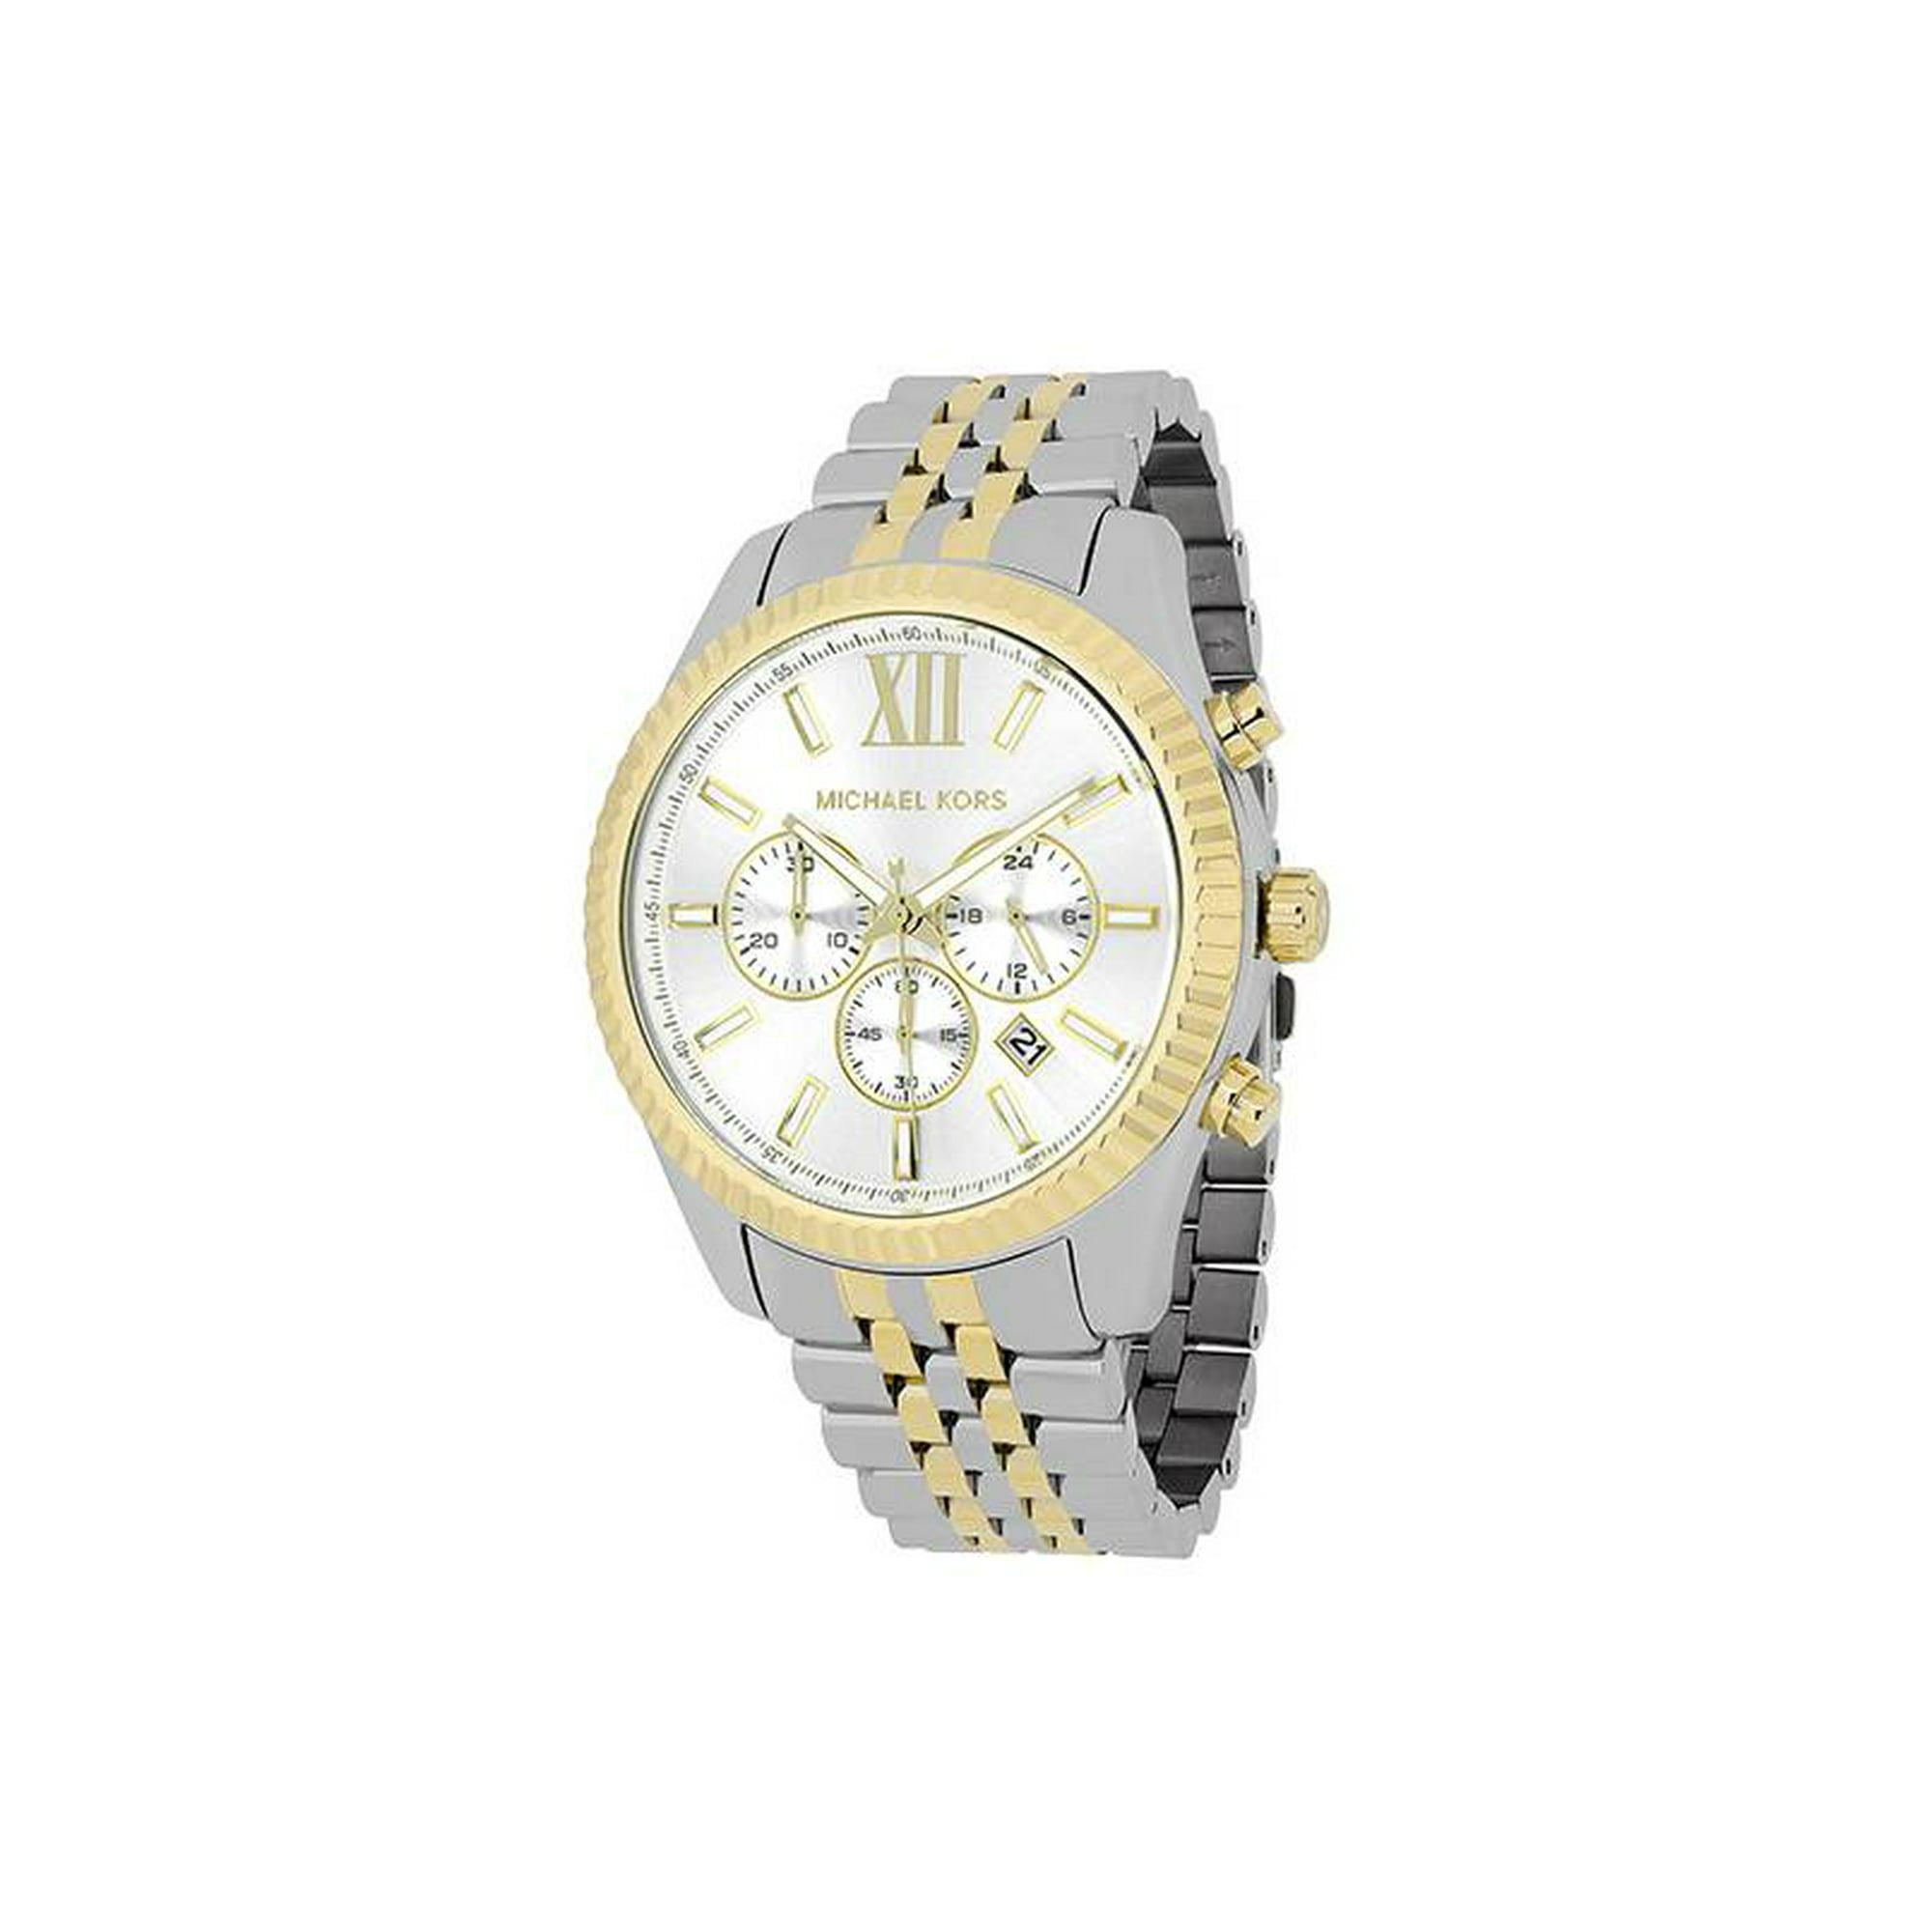 826cf9940eeb Buy Michael Kors Men s Lexington Two Tone Stainless Steel Watch ...